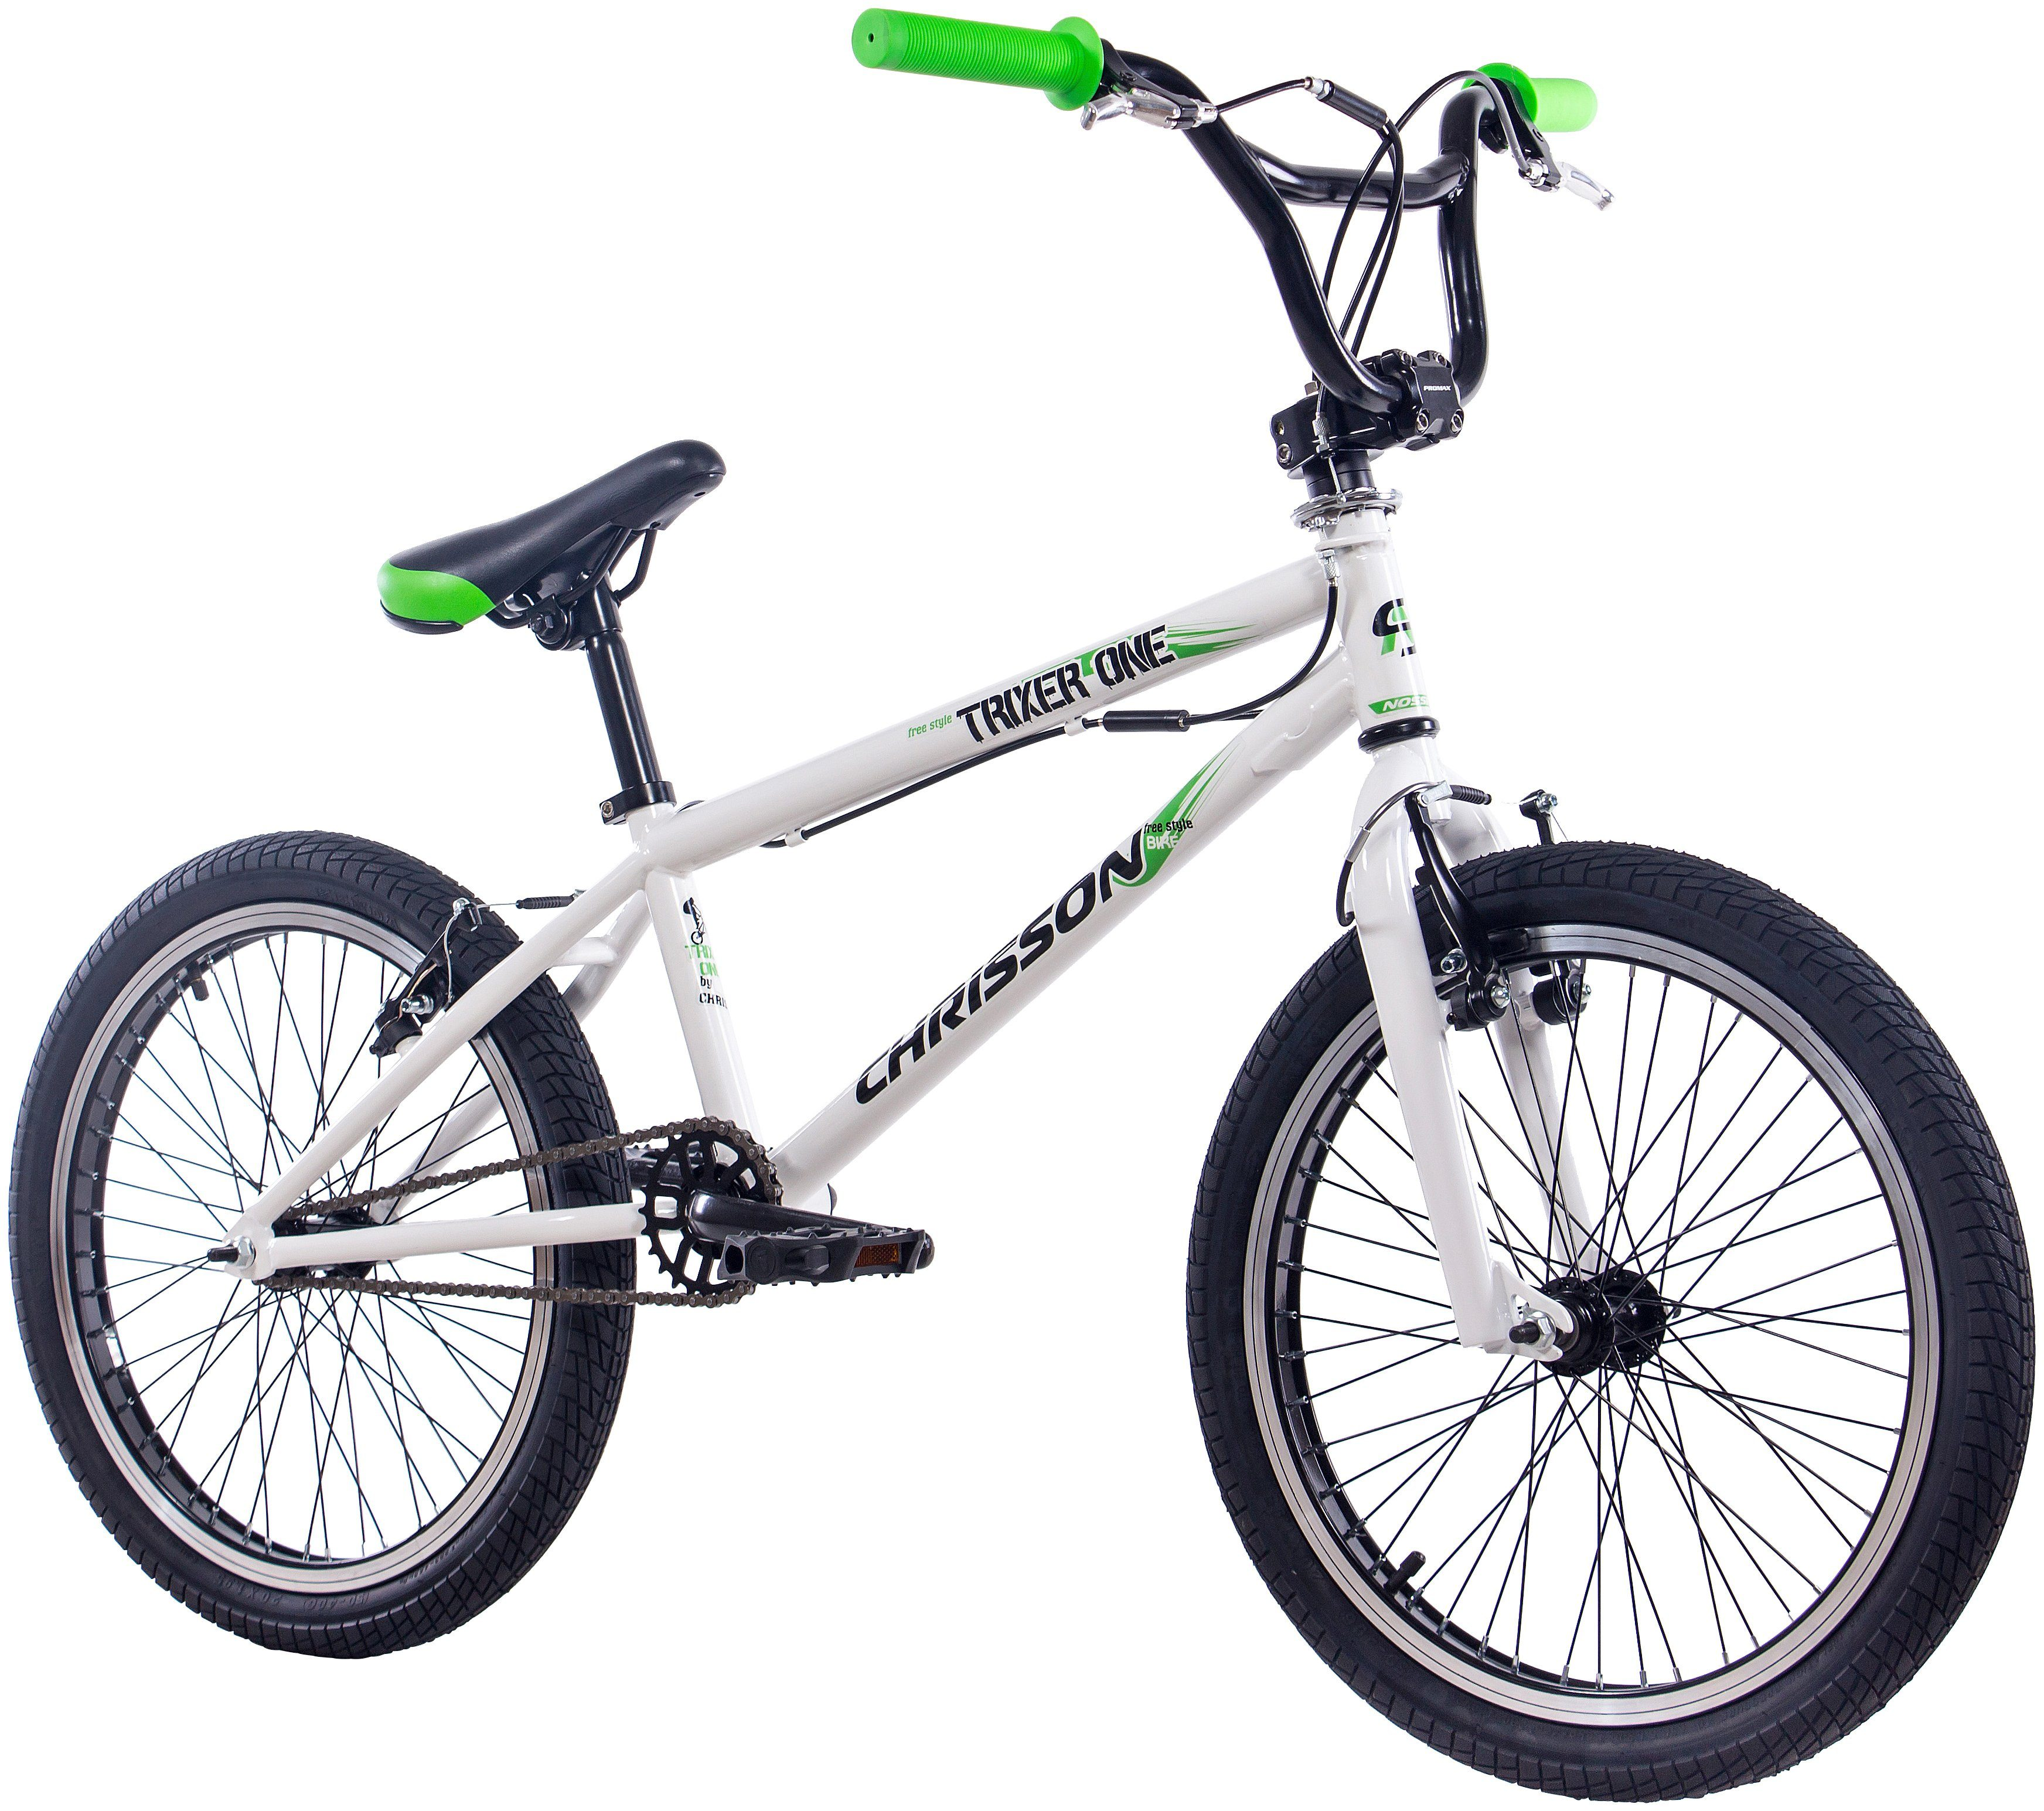 Chrisson BMX »CHRISSON BMX TRIXER ONE«, 20 Zoll, 1 Gang, V-Bremsen